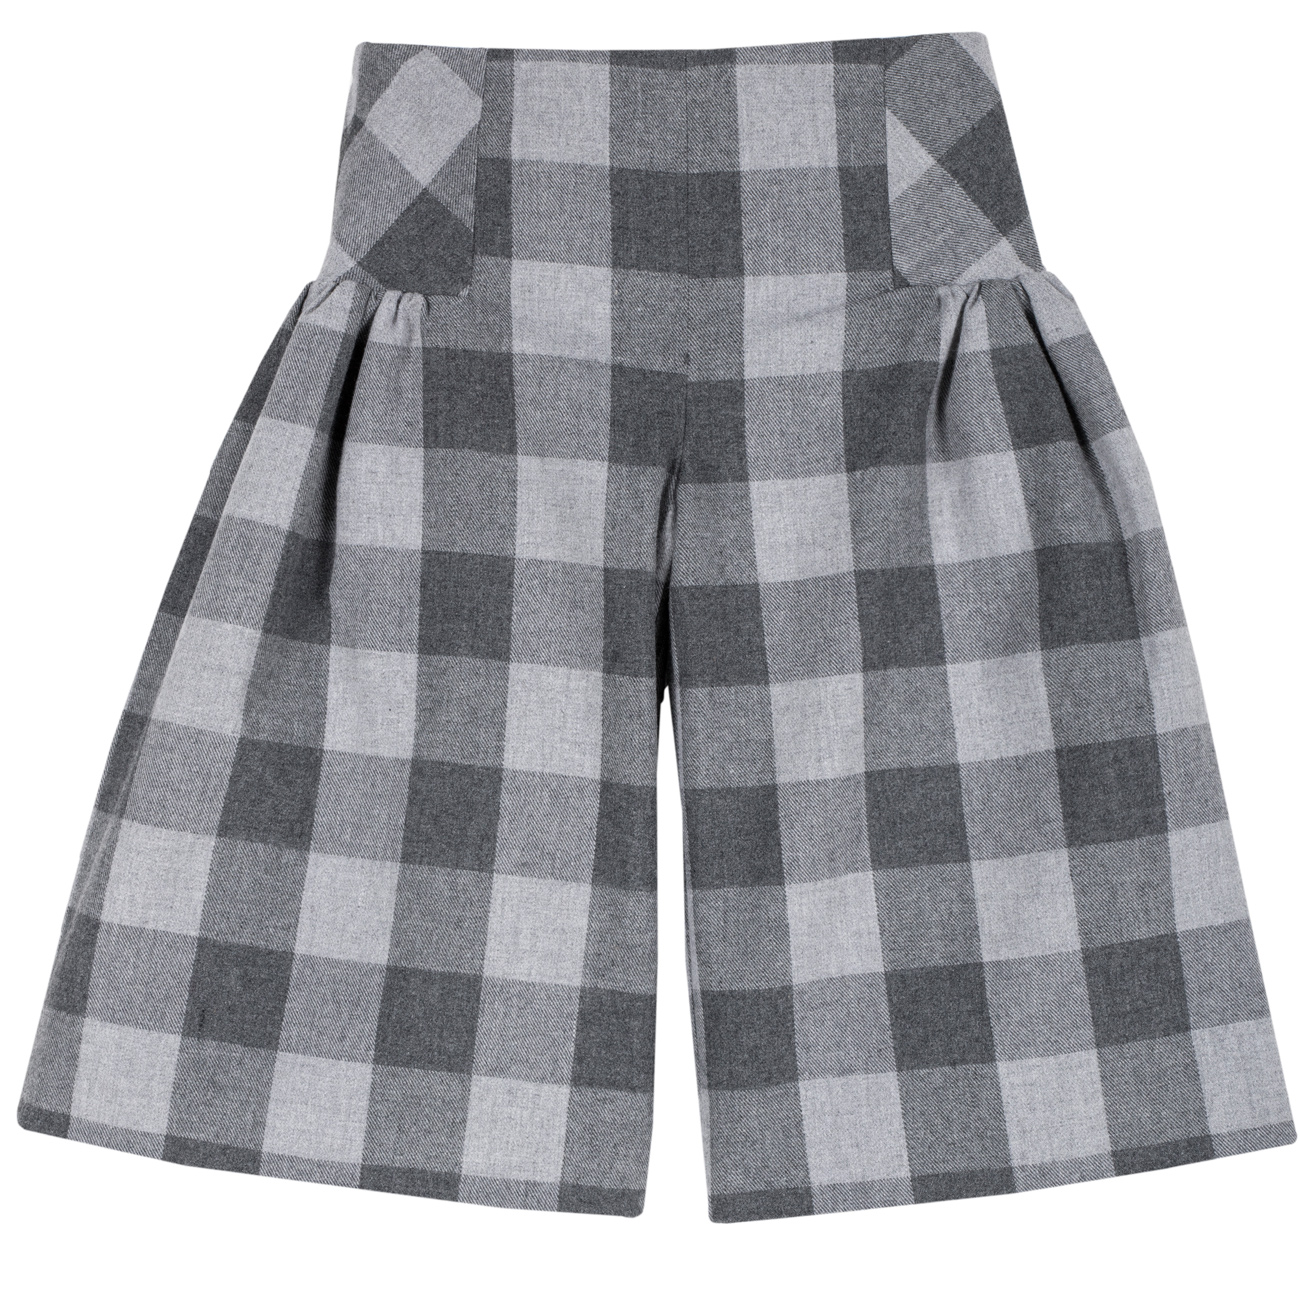 Pantalon copii Chicco, gri inchis